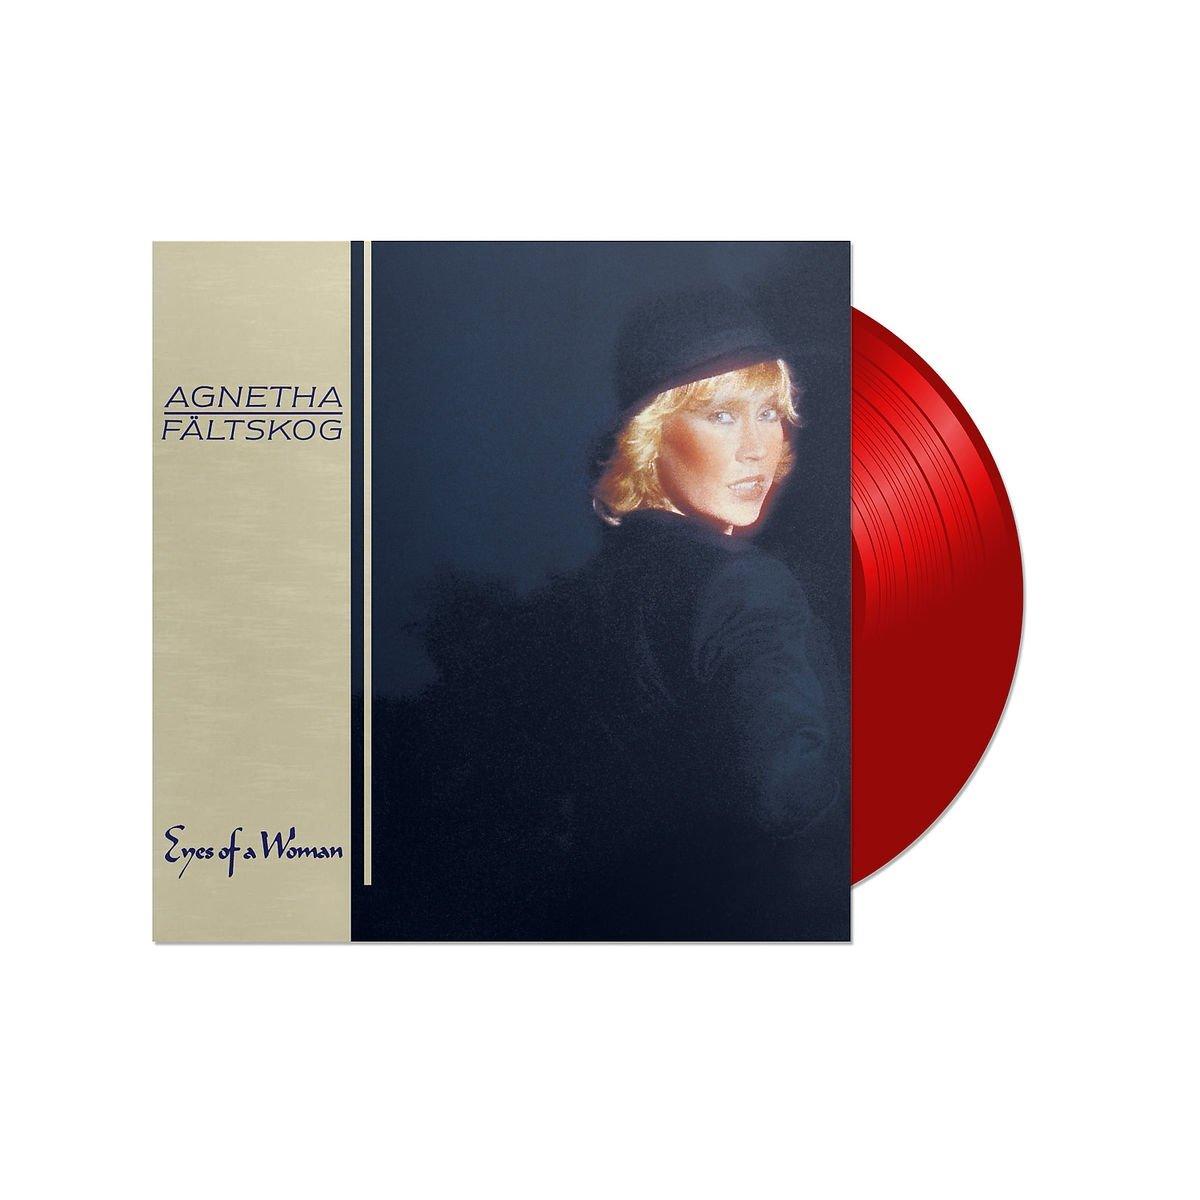 Vinilo : Agnetha Faltskog - Eyes Of A Woman (Red Vinyl) (Colored Vinyl, Red, Holland - Import)